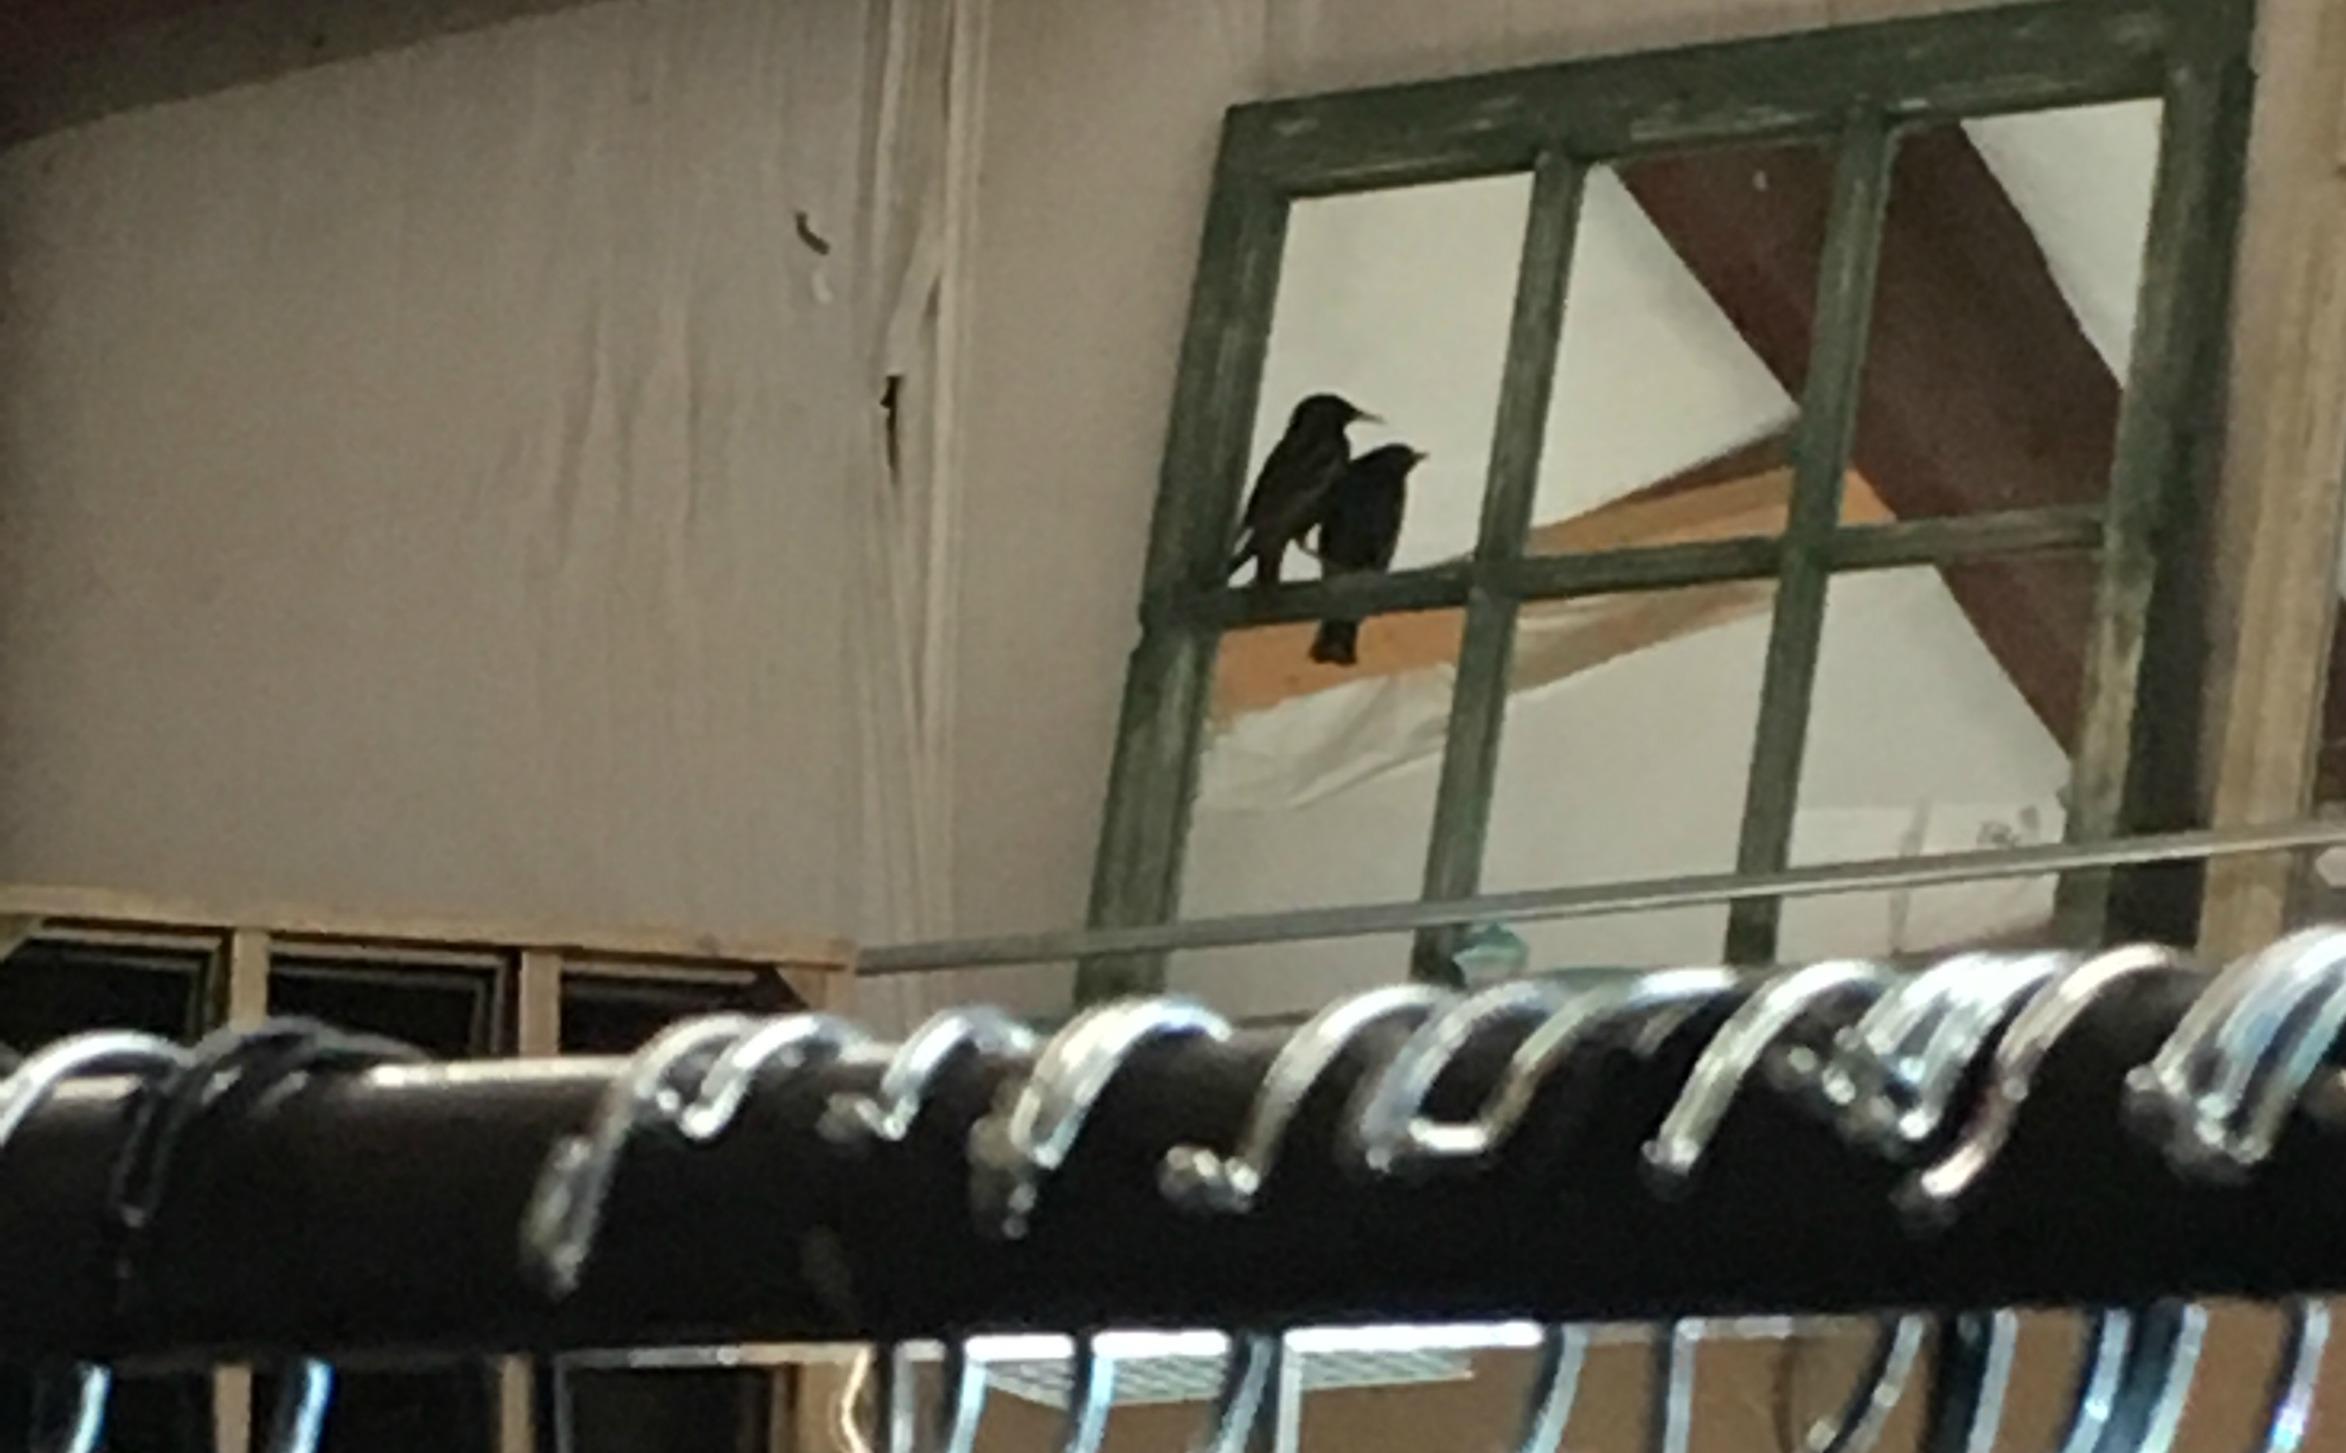 Bird in the Store